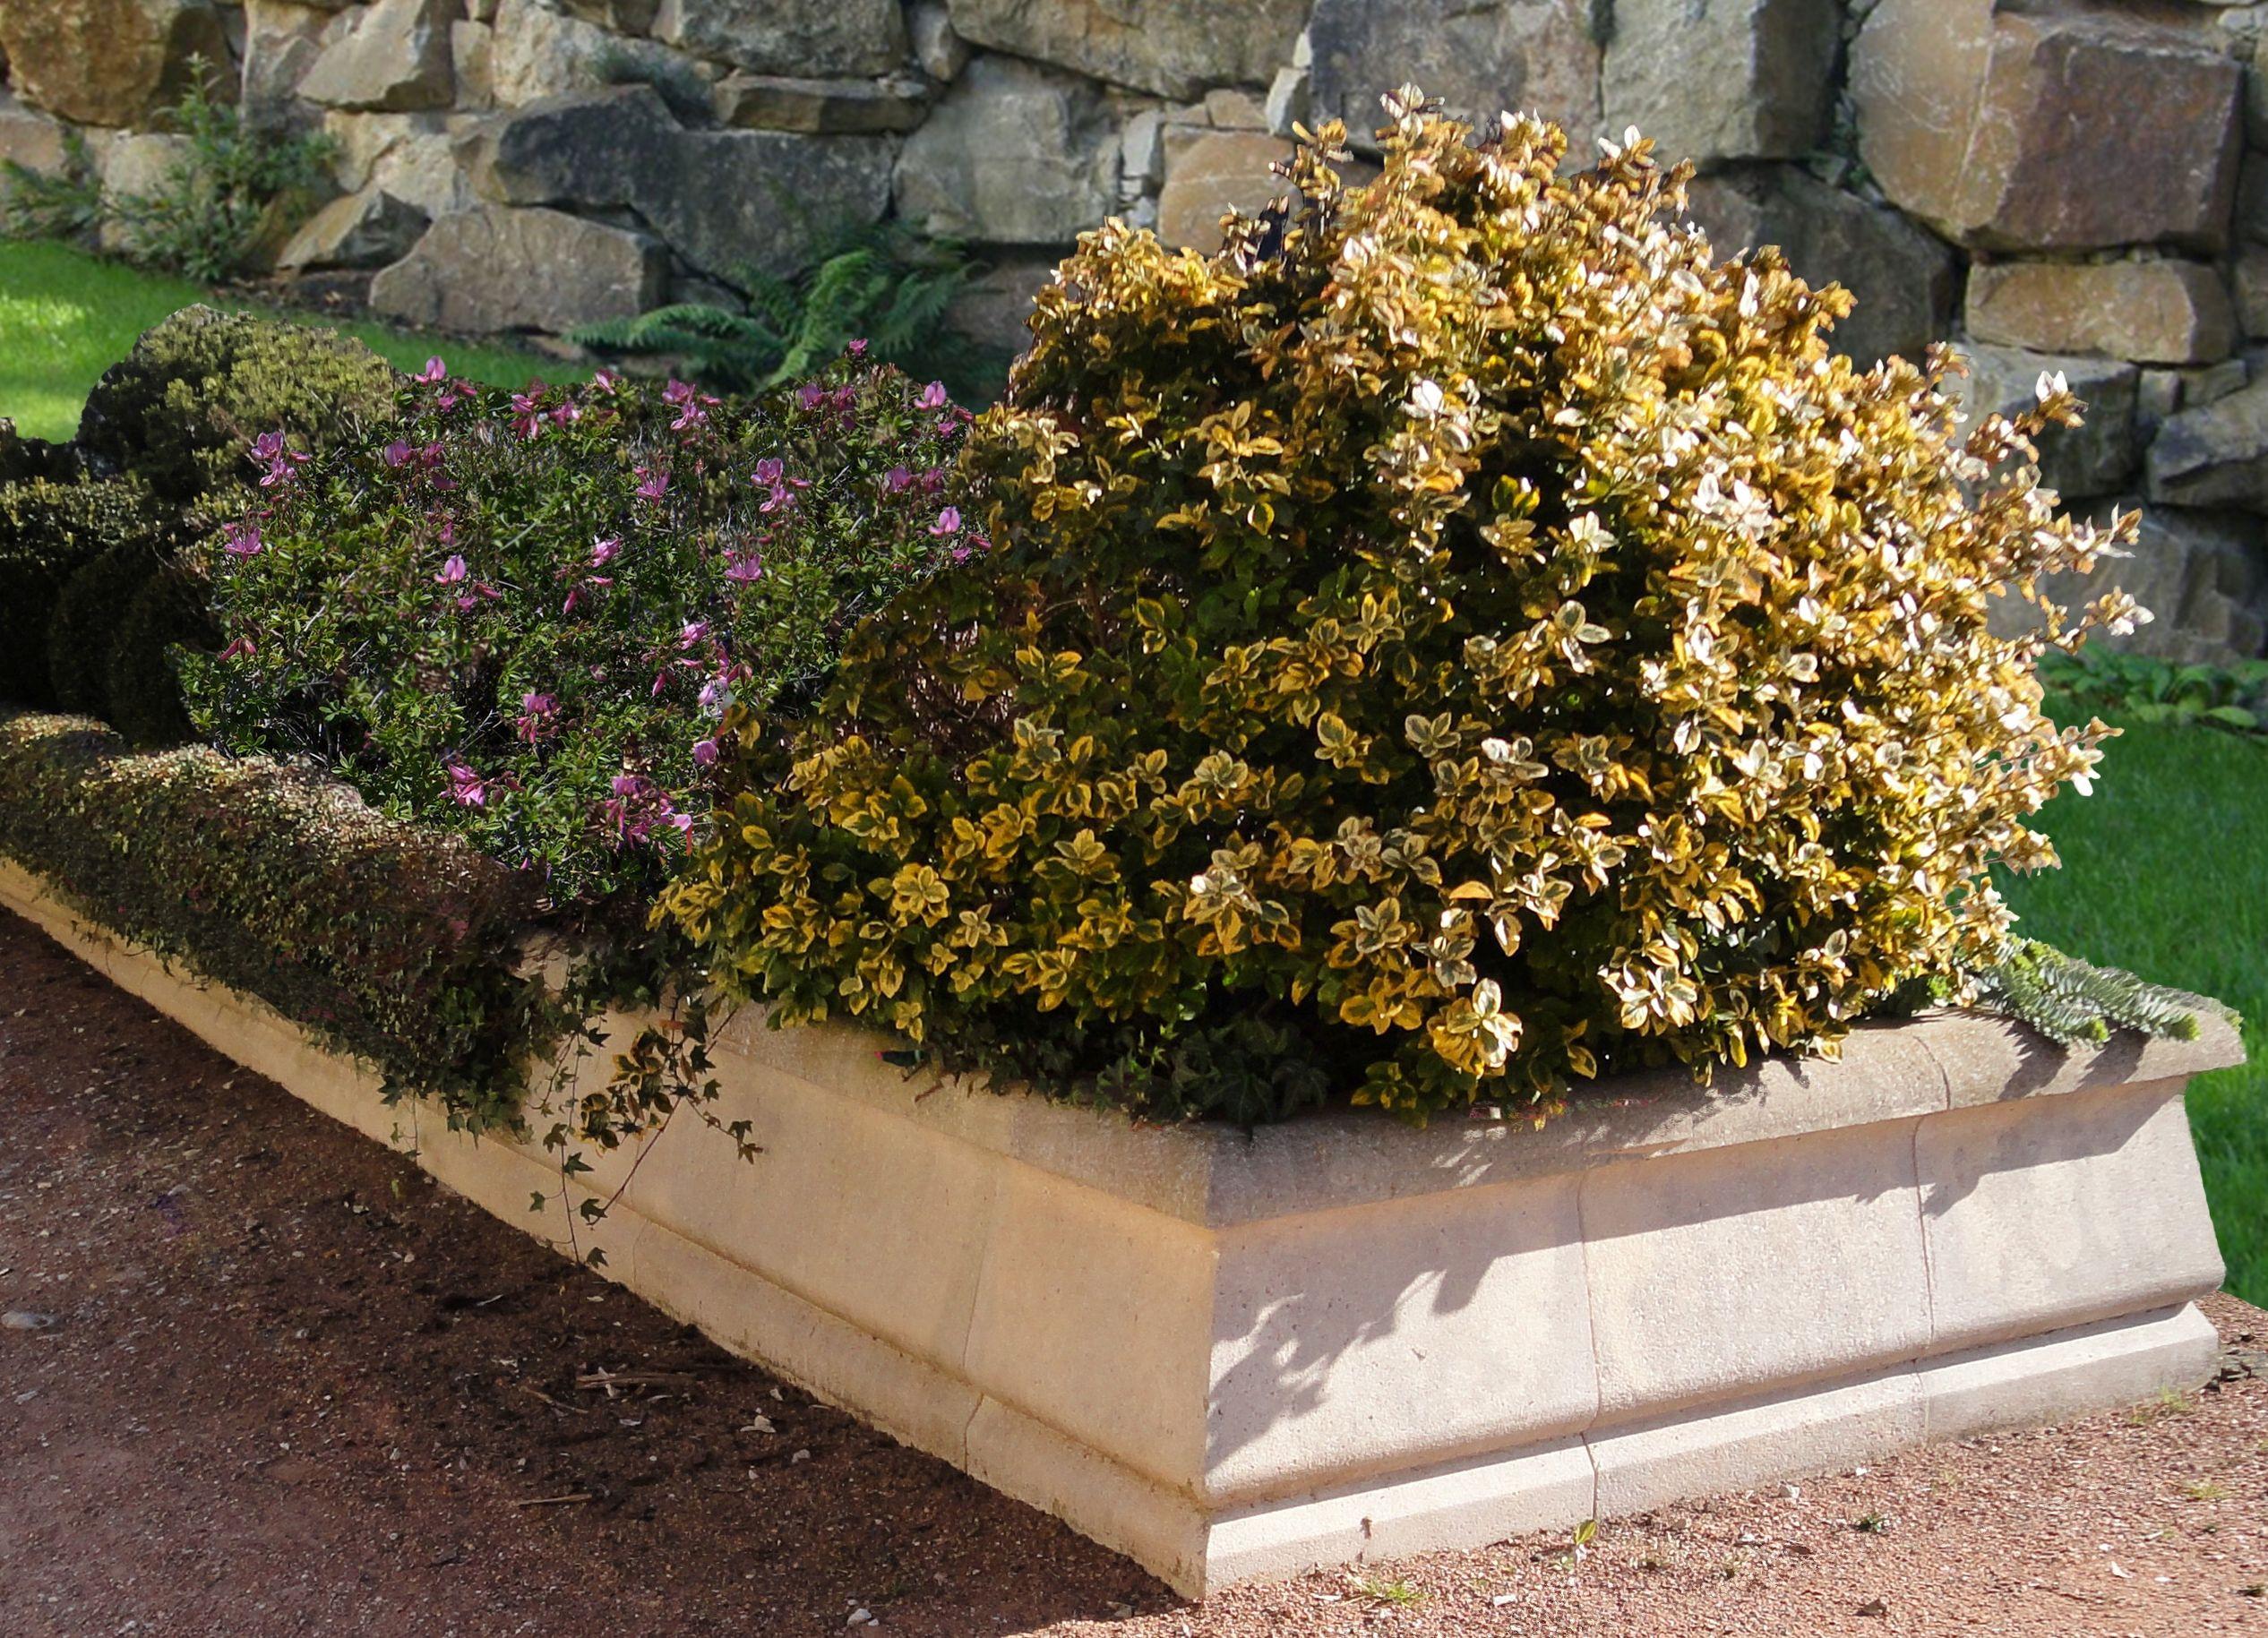 Bordure Modulable Brico Depot Luxe Galerie Bordures De Jardin En Beton Plus formidable Jardini¨re En Pierre